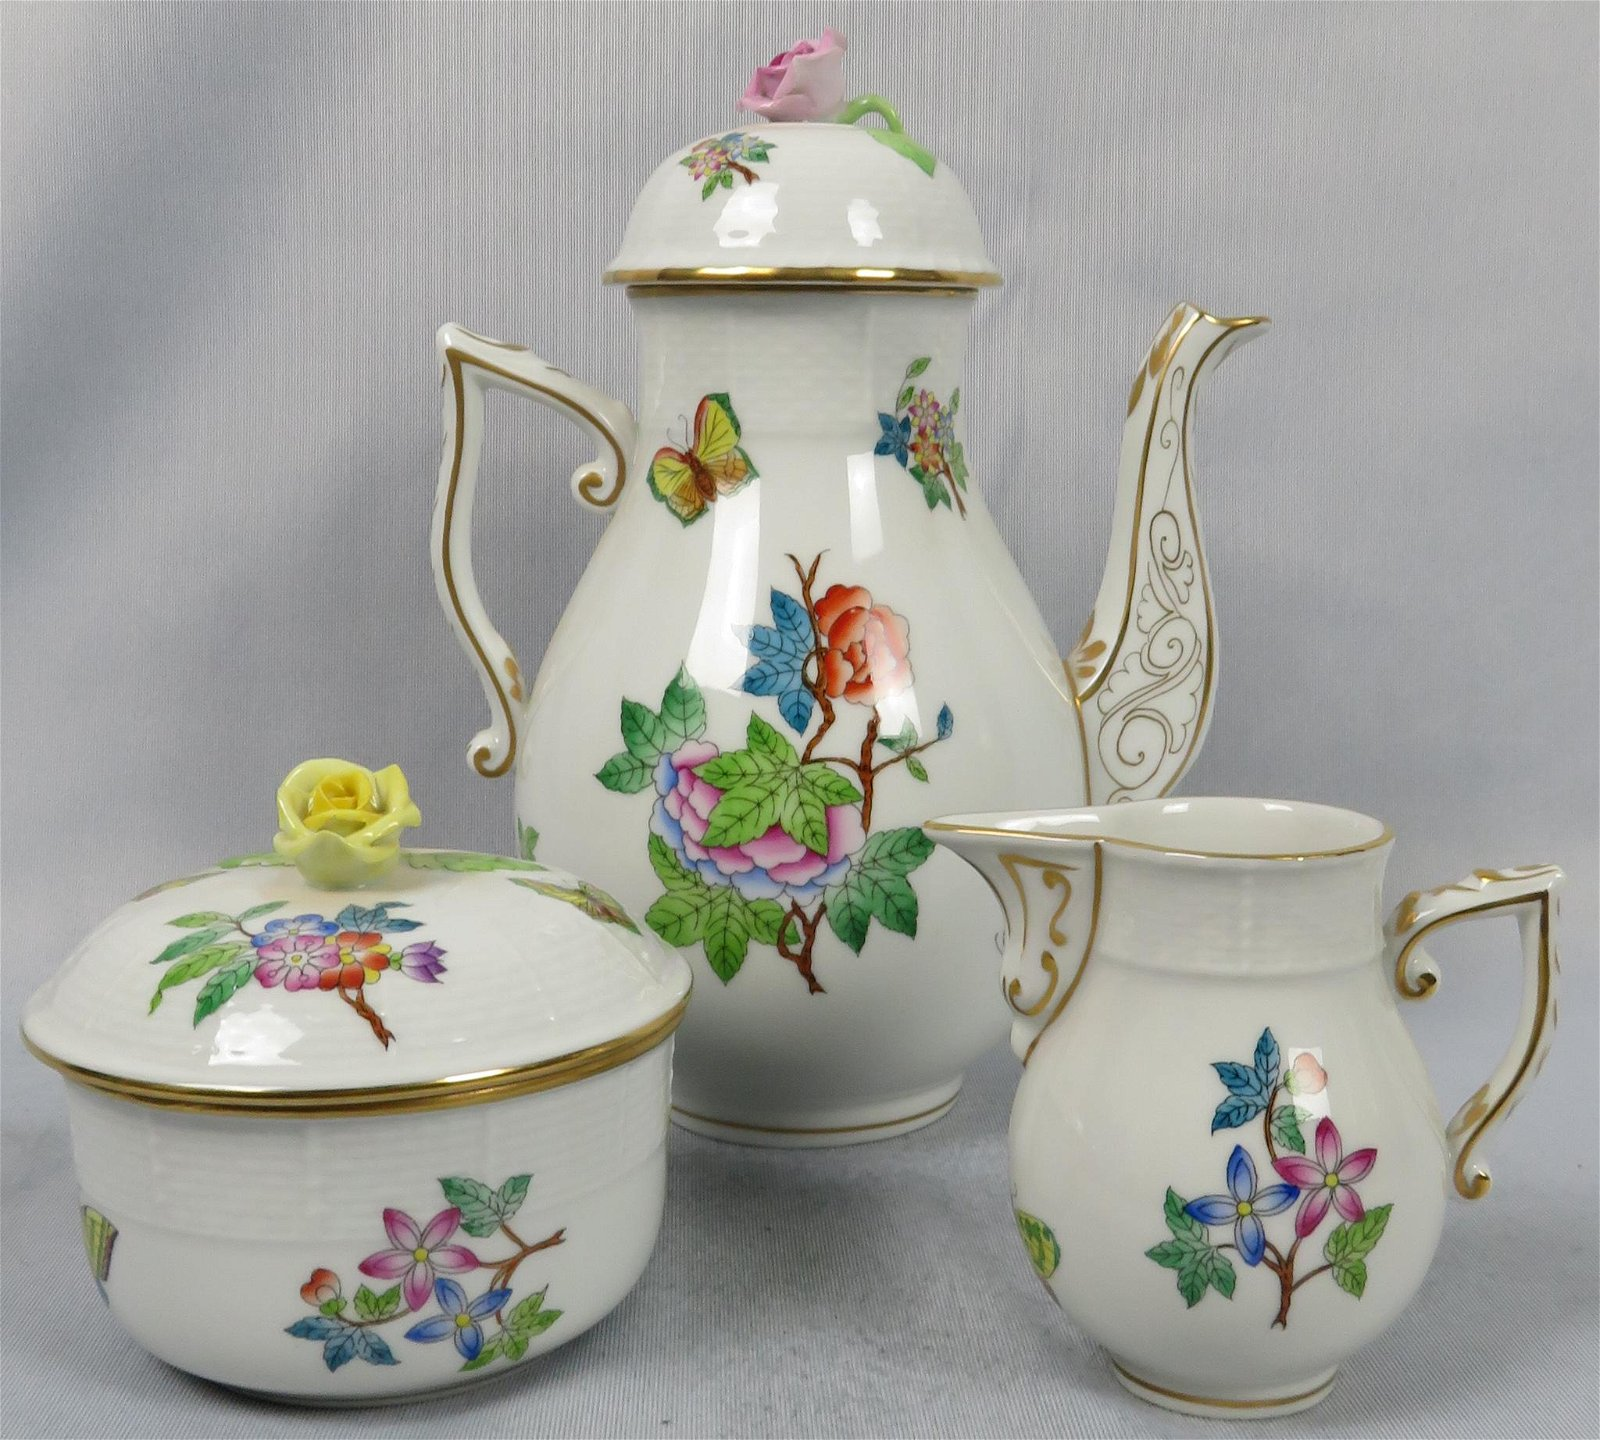 Herend Porcelain Queen Victoria 3 Piece Coffee Service